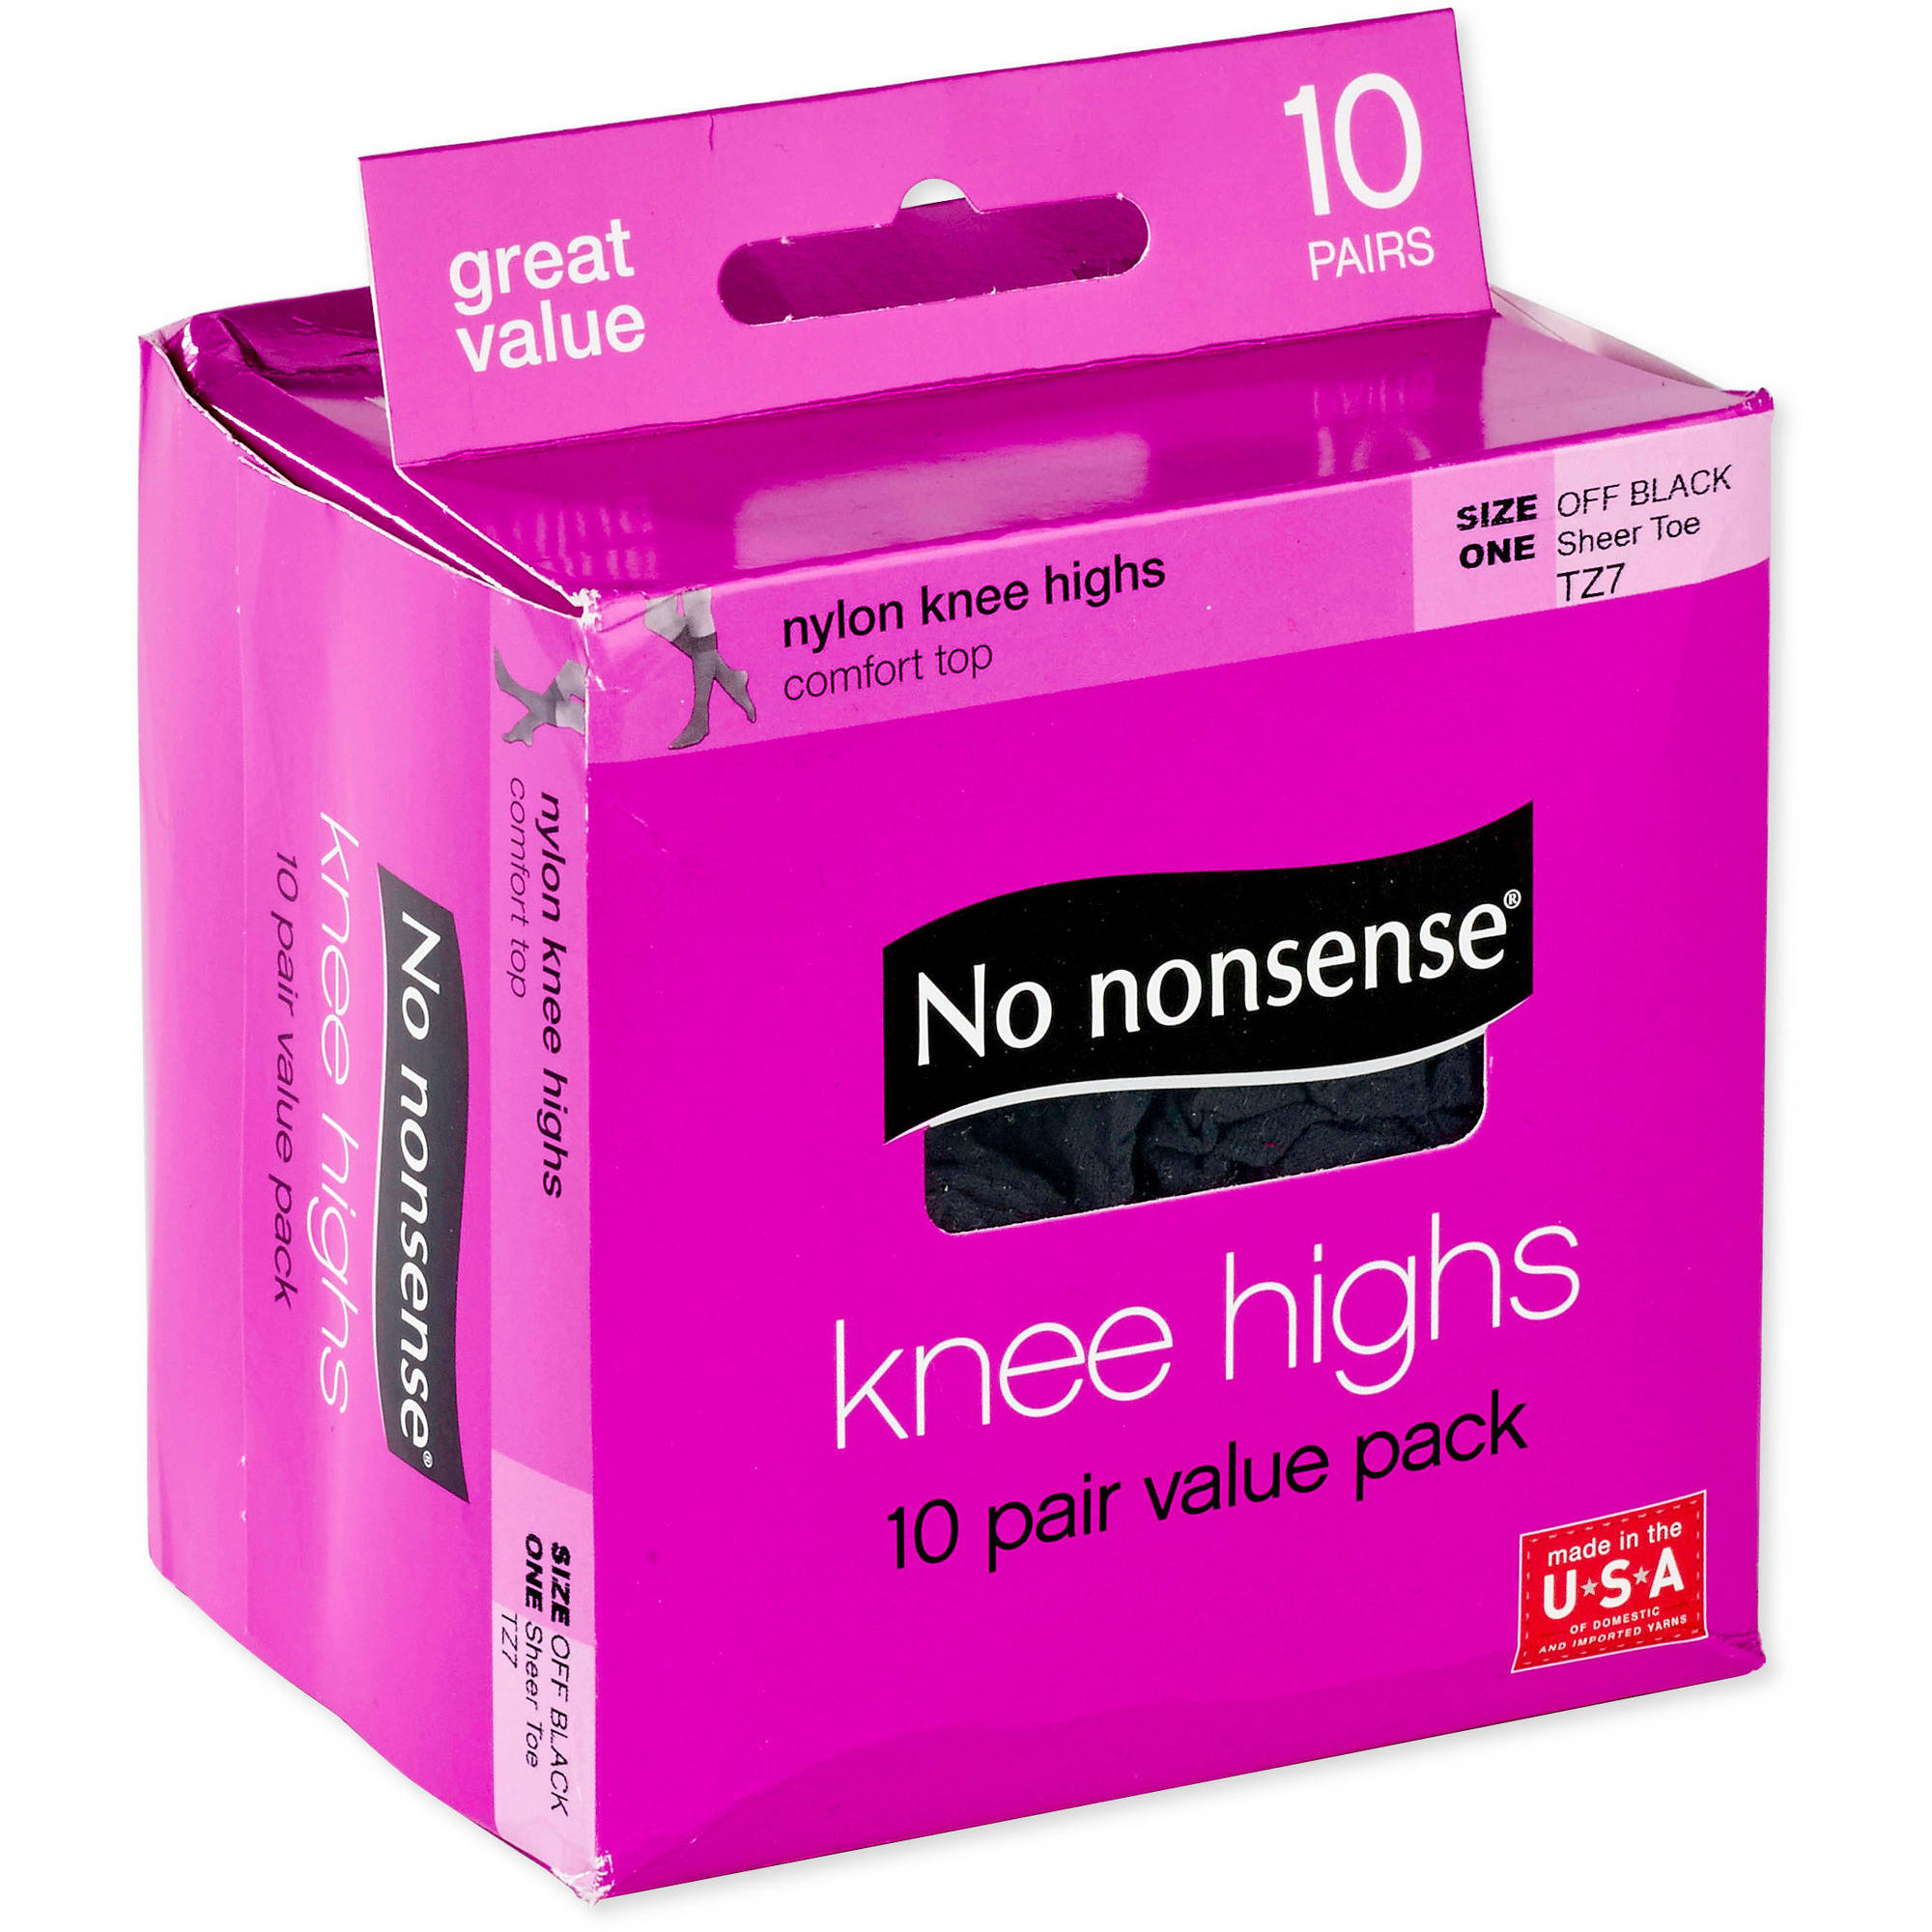 No nonsense Nylon Knee Highs Value Pack Off Black, Sheer Toe - 10 PR, 10.0 PR